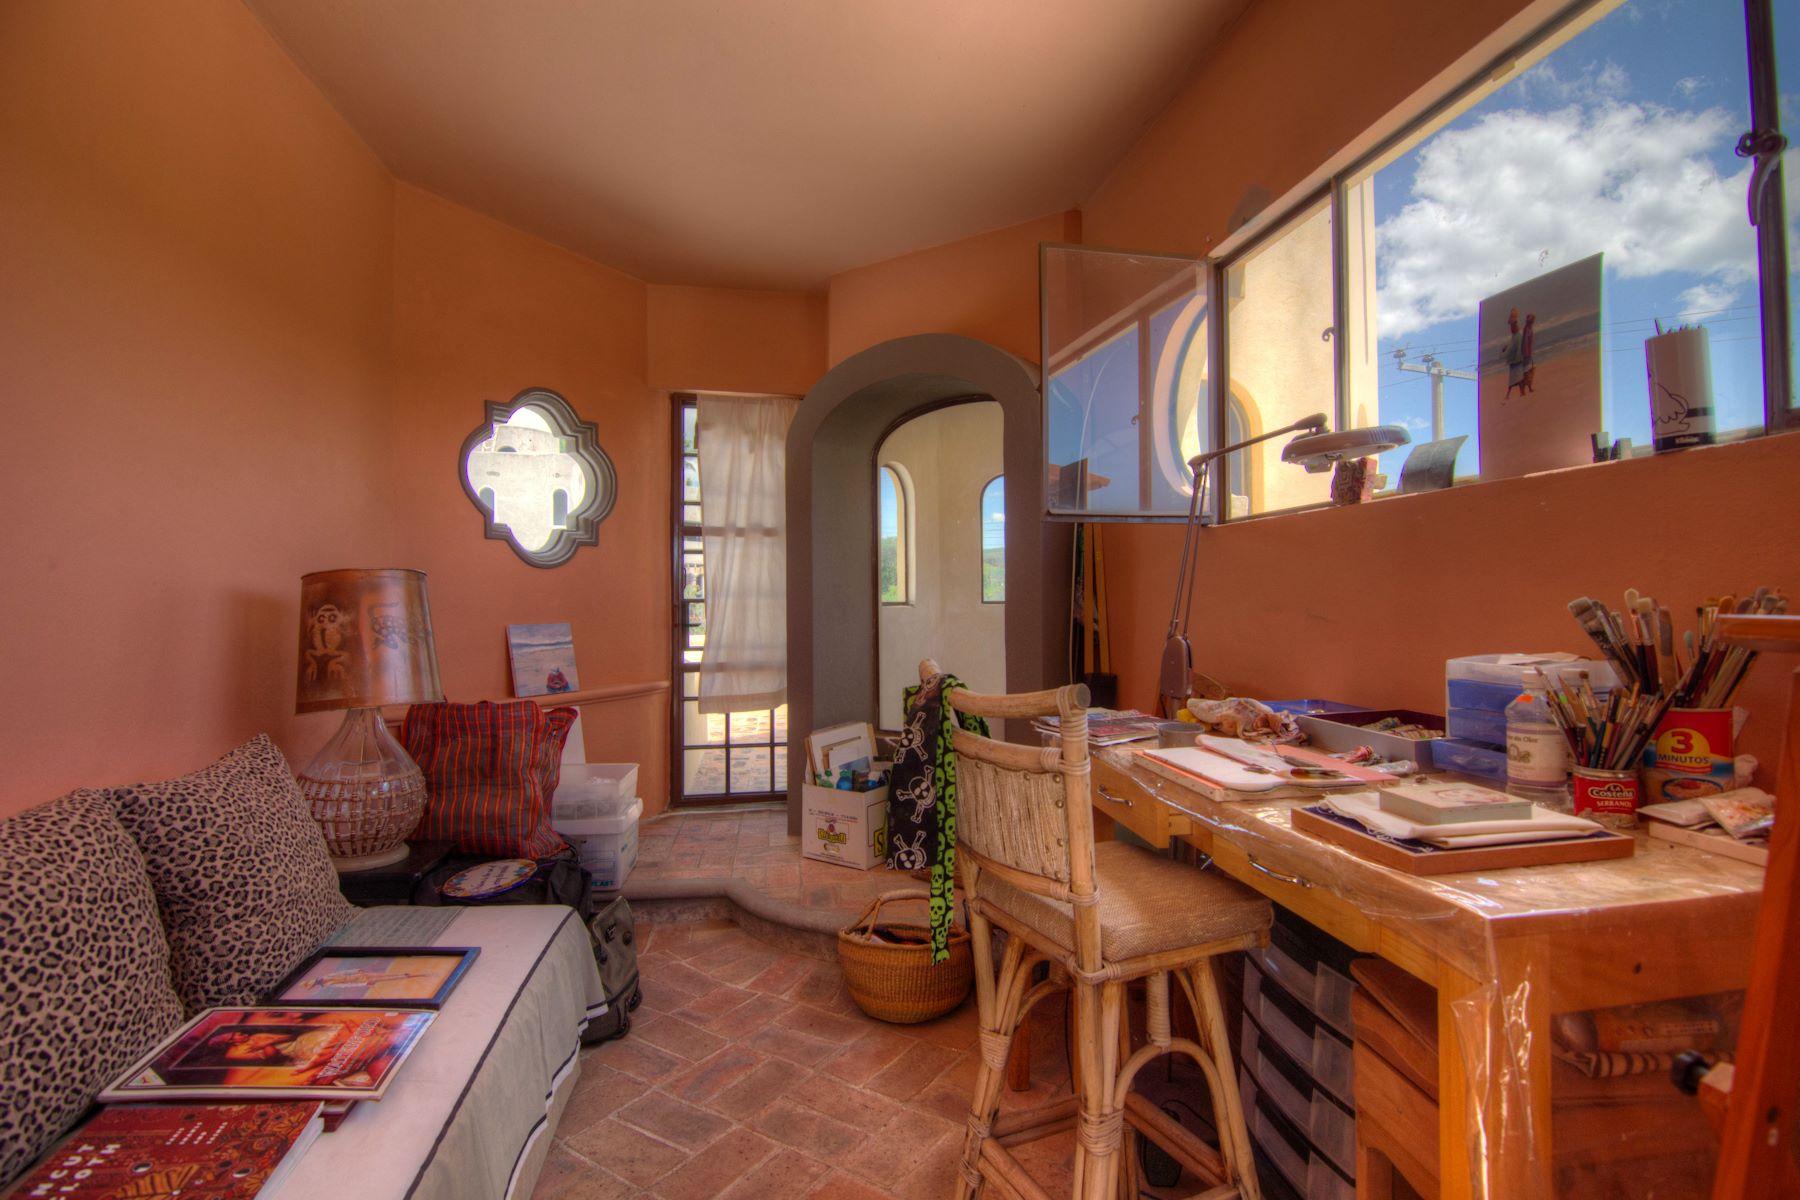 Additional photo for property listing at Casa Candelaria Los Frailes, San Miguel De Allende, Guanajuato Mexico